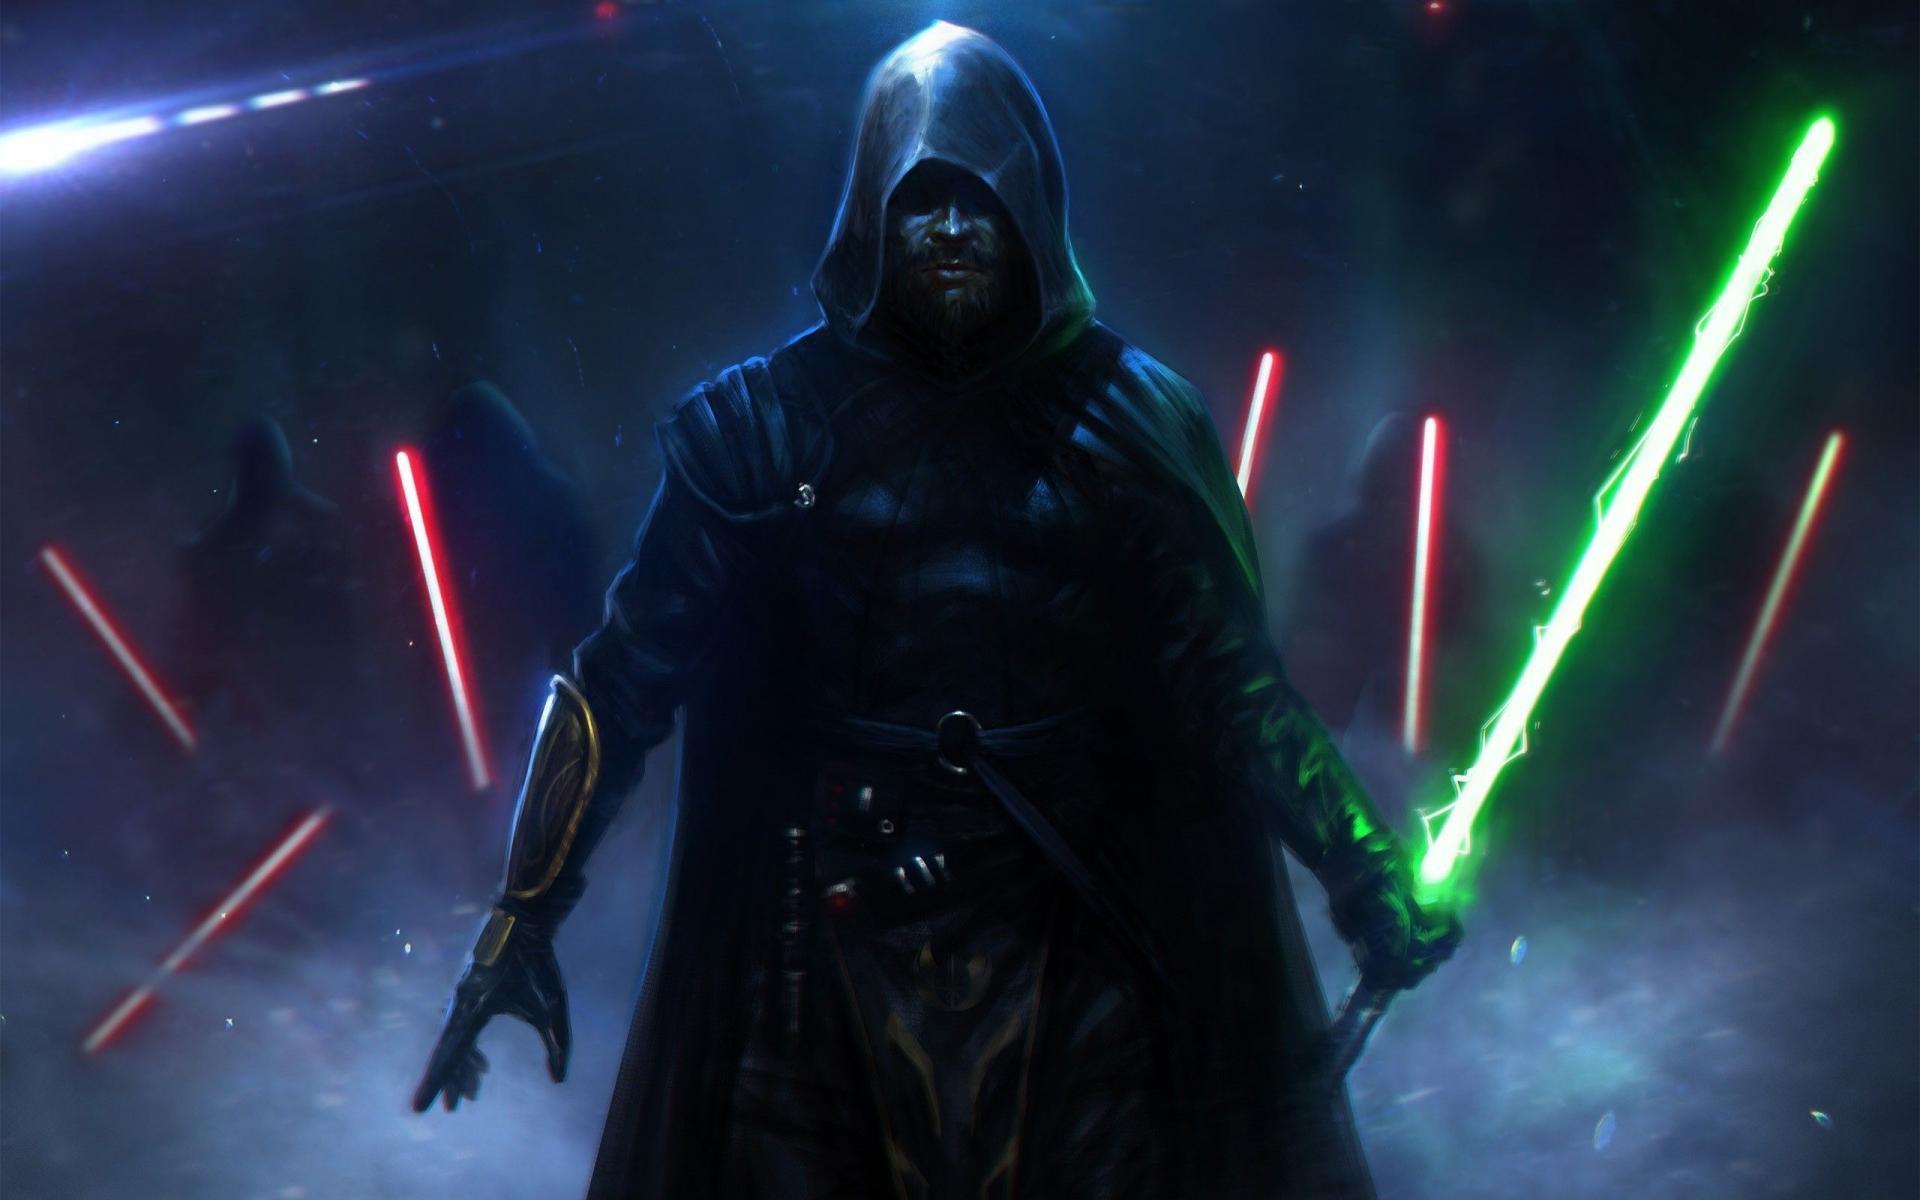 Respawn S Star Wars Jedi Fallen Order Set For April Reveal Slashgear